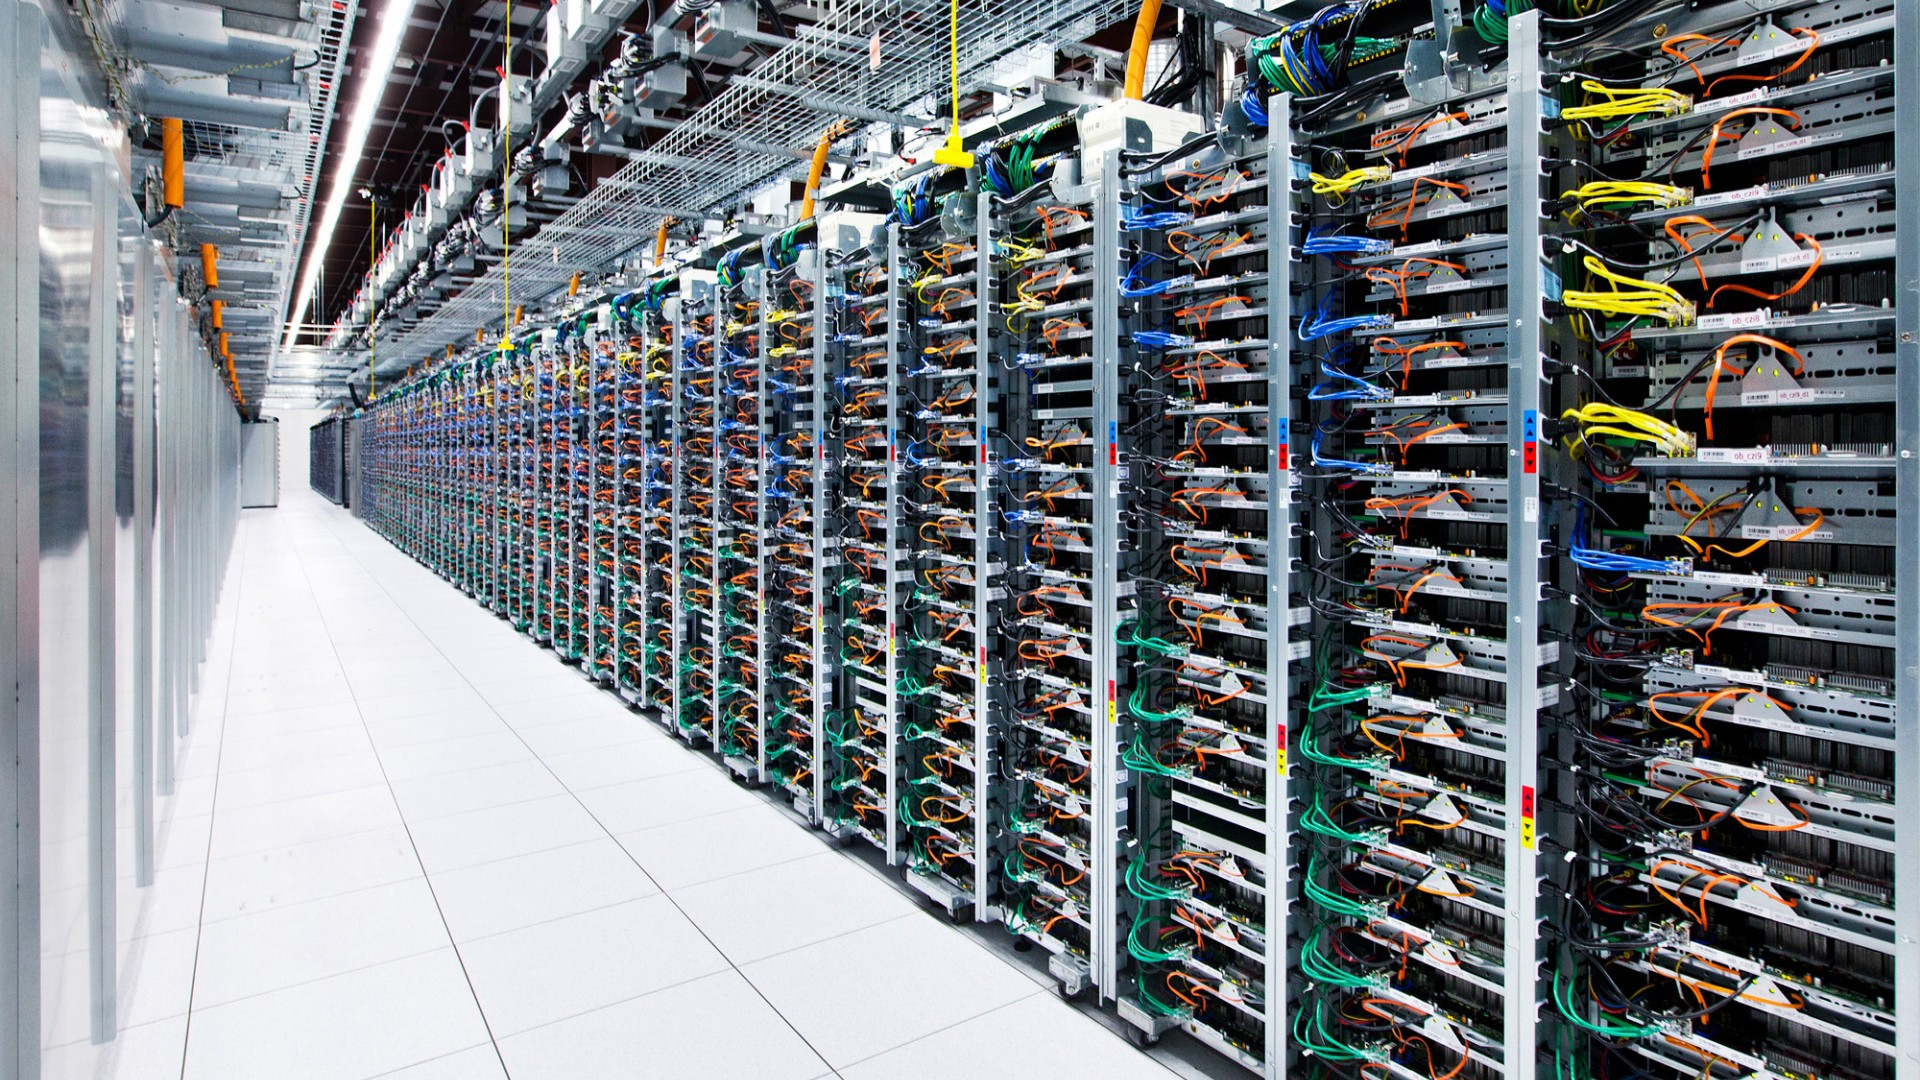 Data Center Computer Network Google Server